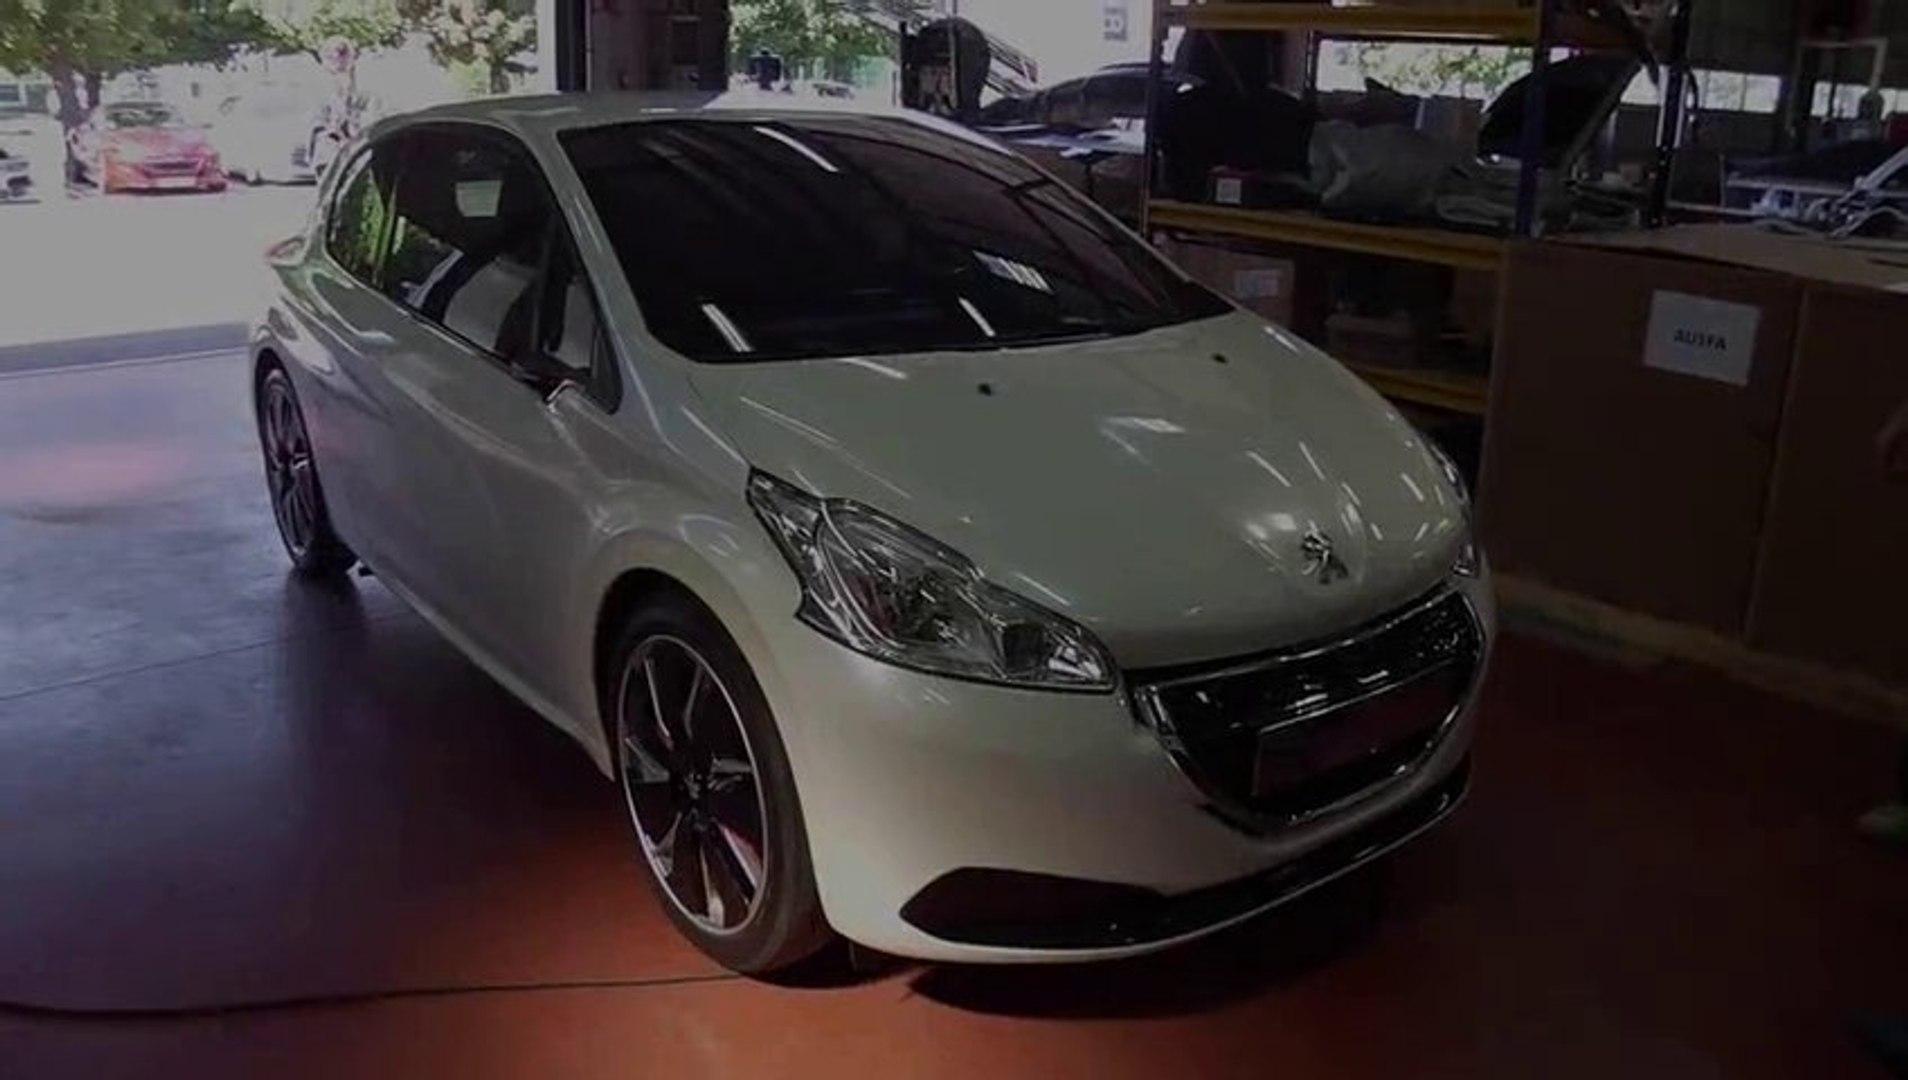 Vidéo de la Peugeot 208 Hybrid FE (2013)